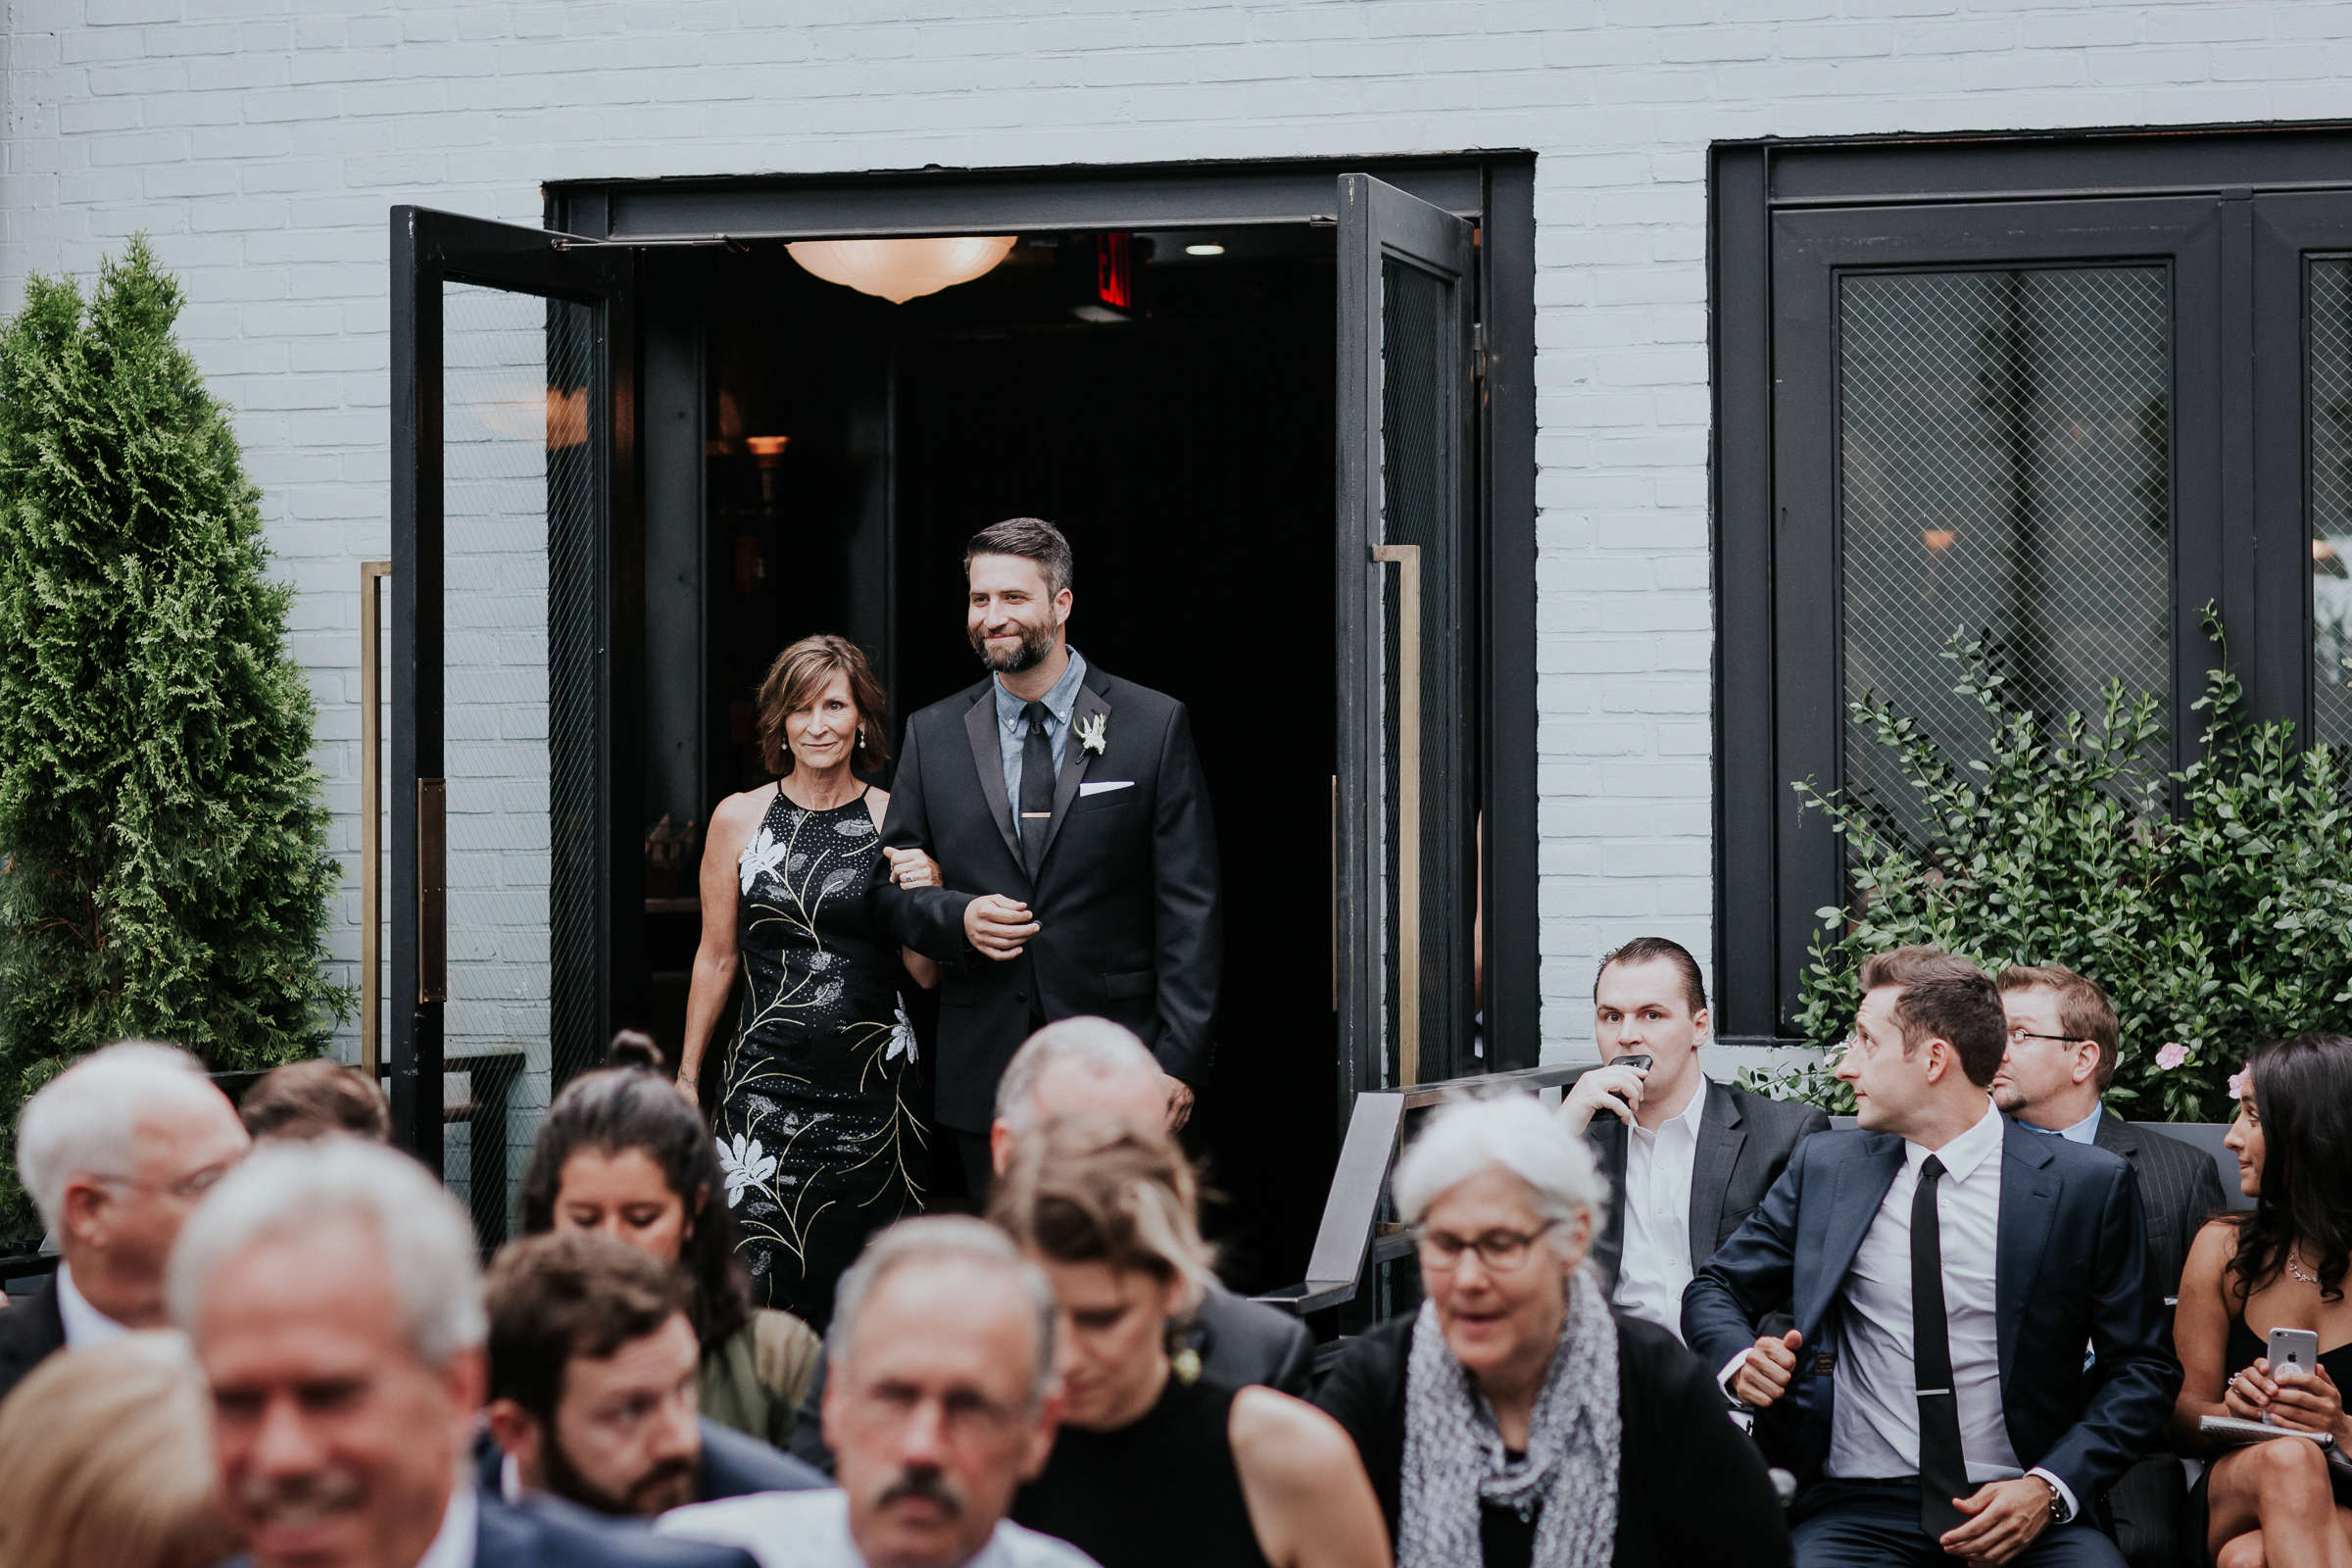 501-Union-Brooklyn-Fine-Art-Documentary-Wedding-Photographer-79.jpg